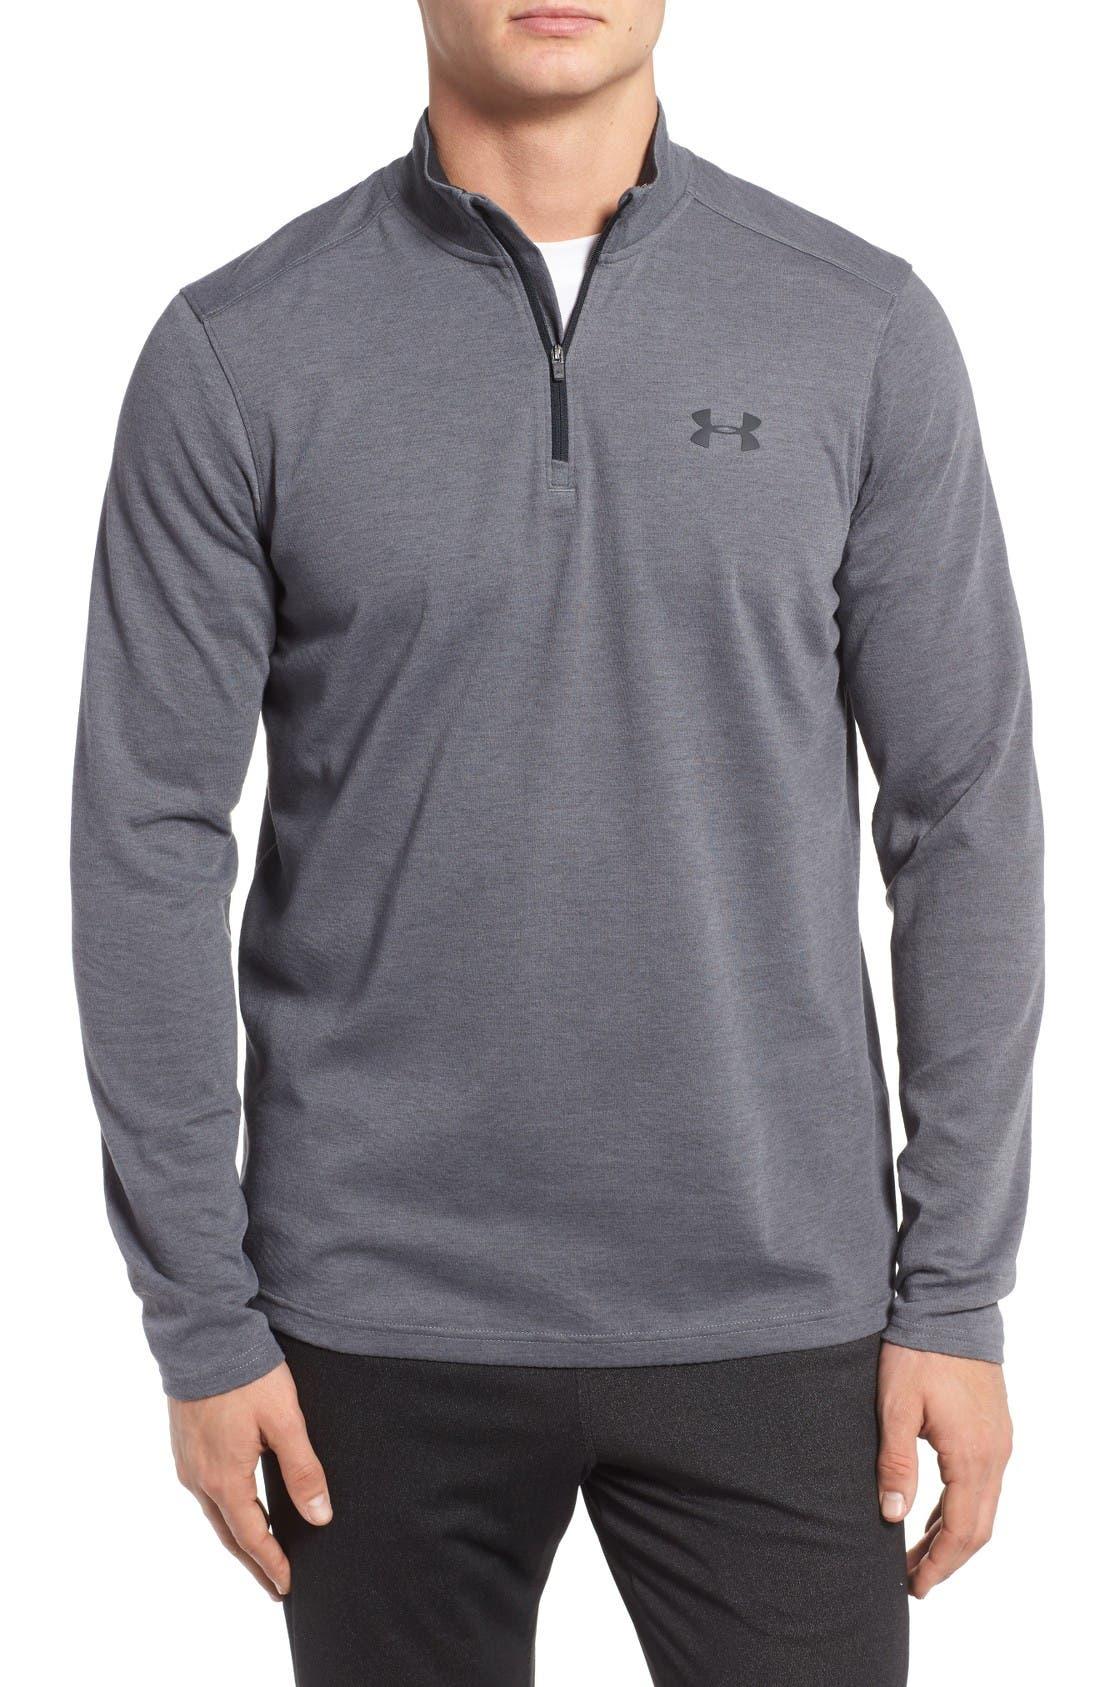 Main Image - Under Armour ColdGear® Quarter-Zip Pullover